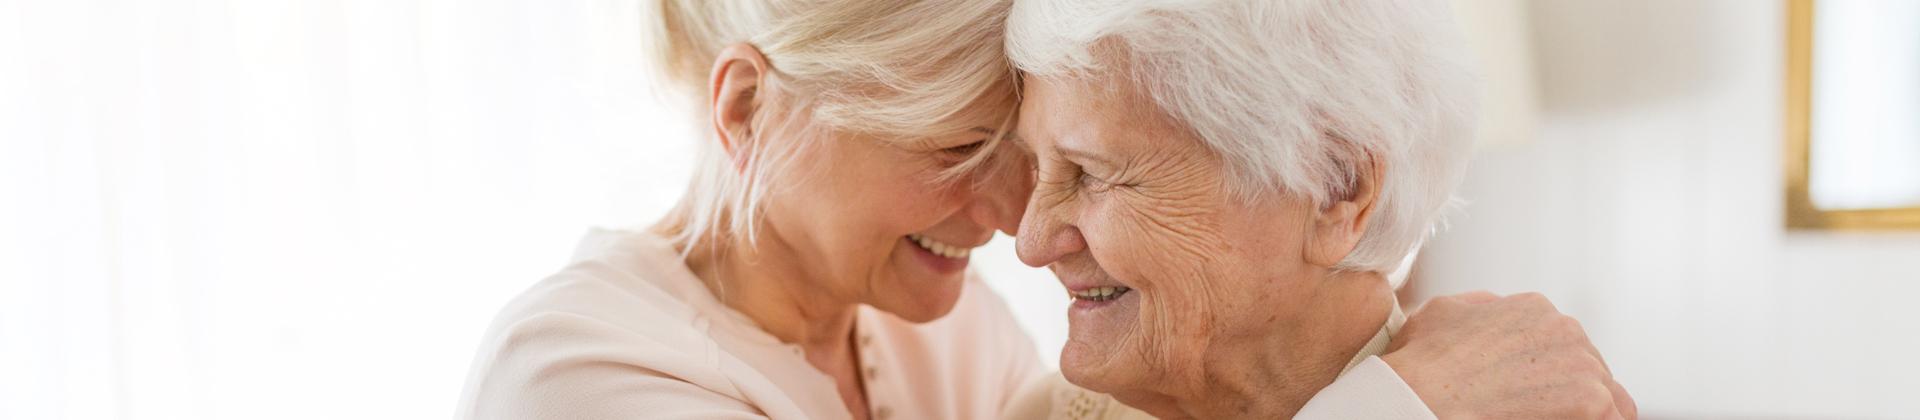 A woman hugs her elderly mother